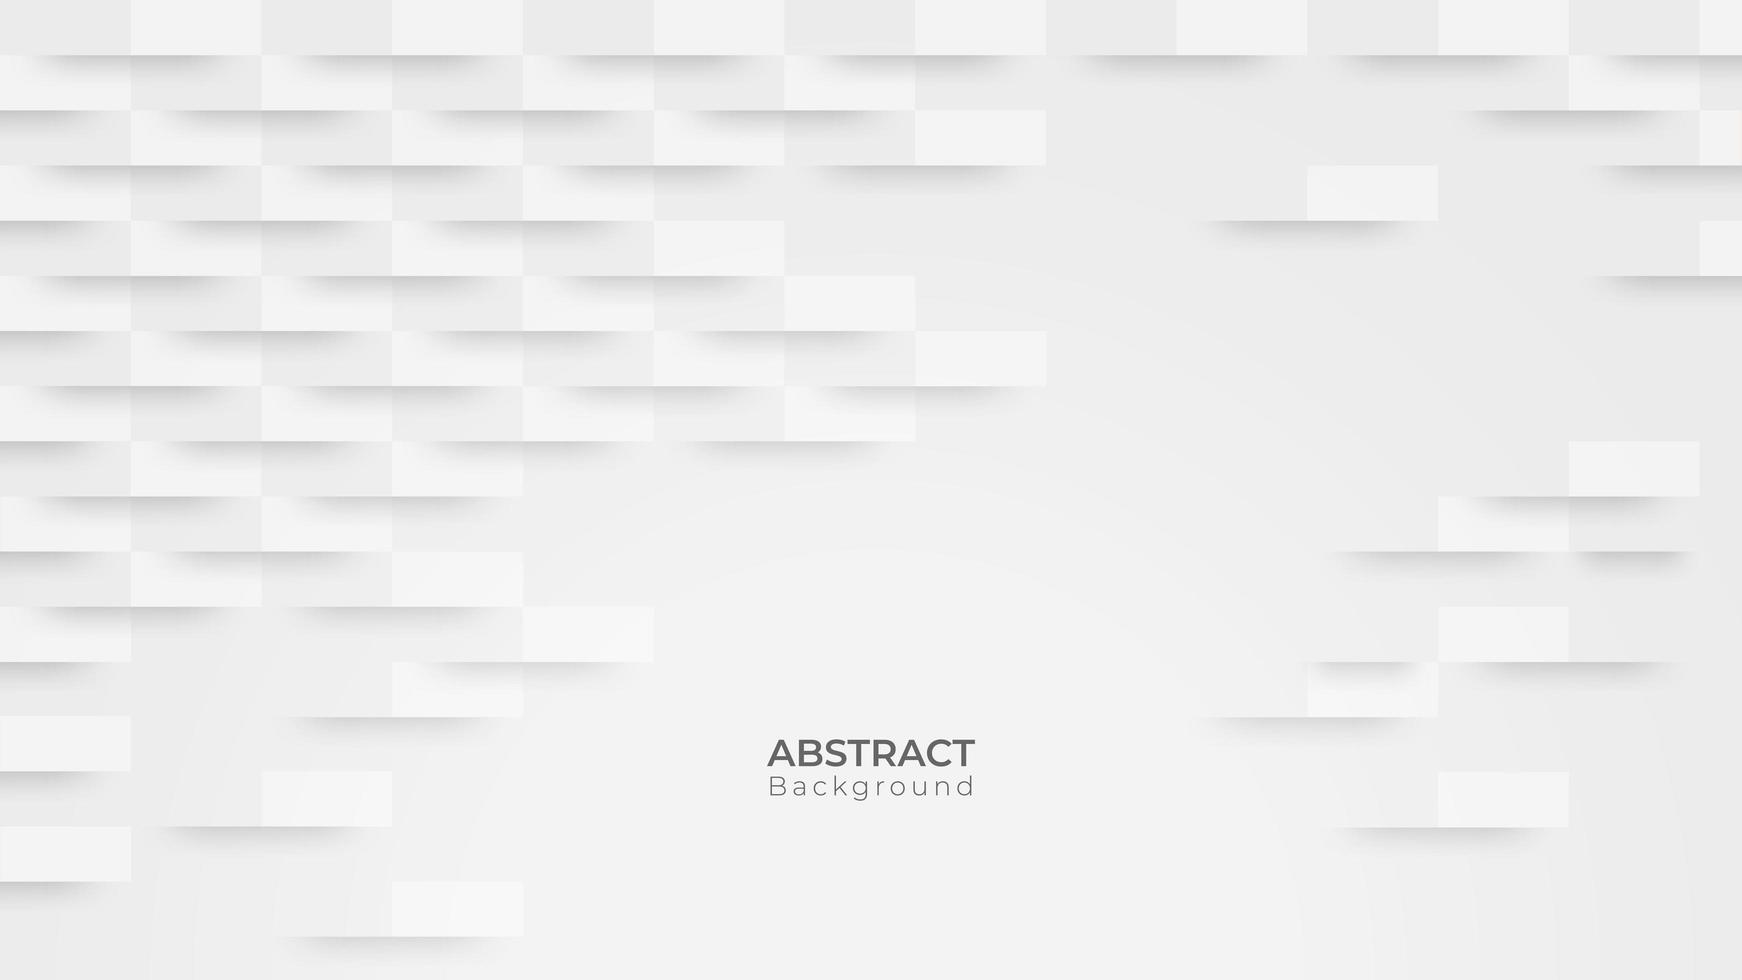 abstracte moderne witte rechthoek achtergrond vector